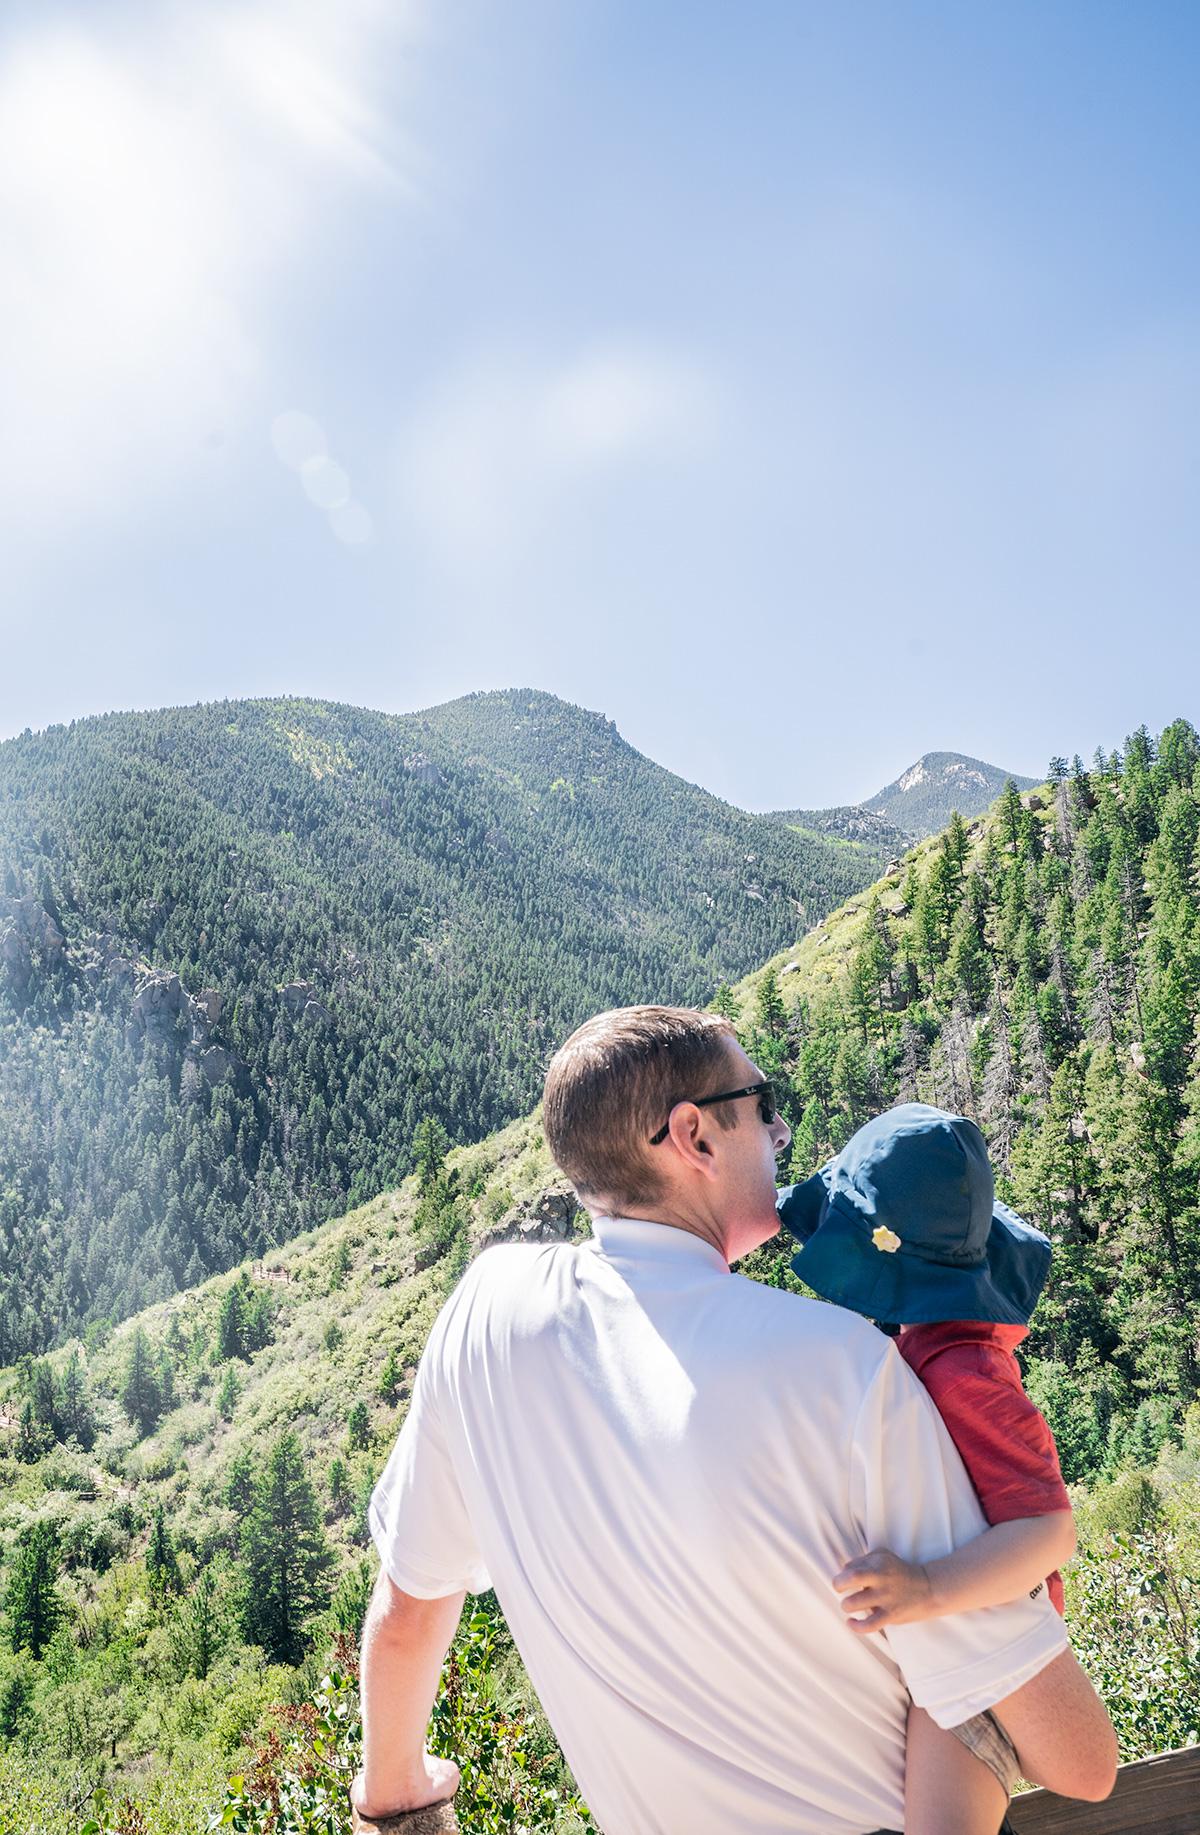 Climbing-Manitou-Incline-Colorado-Springs